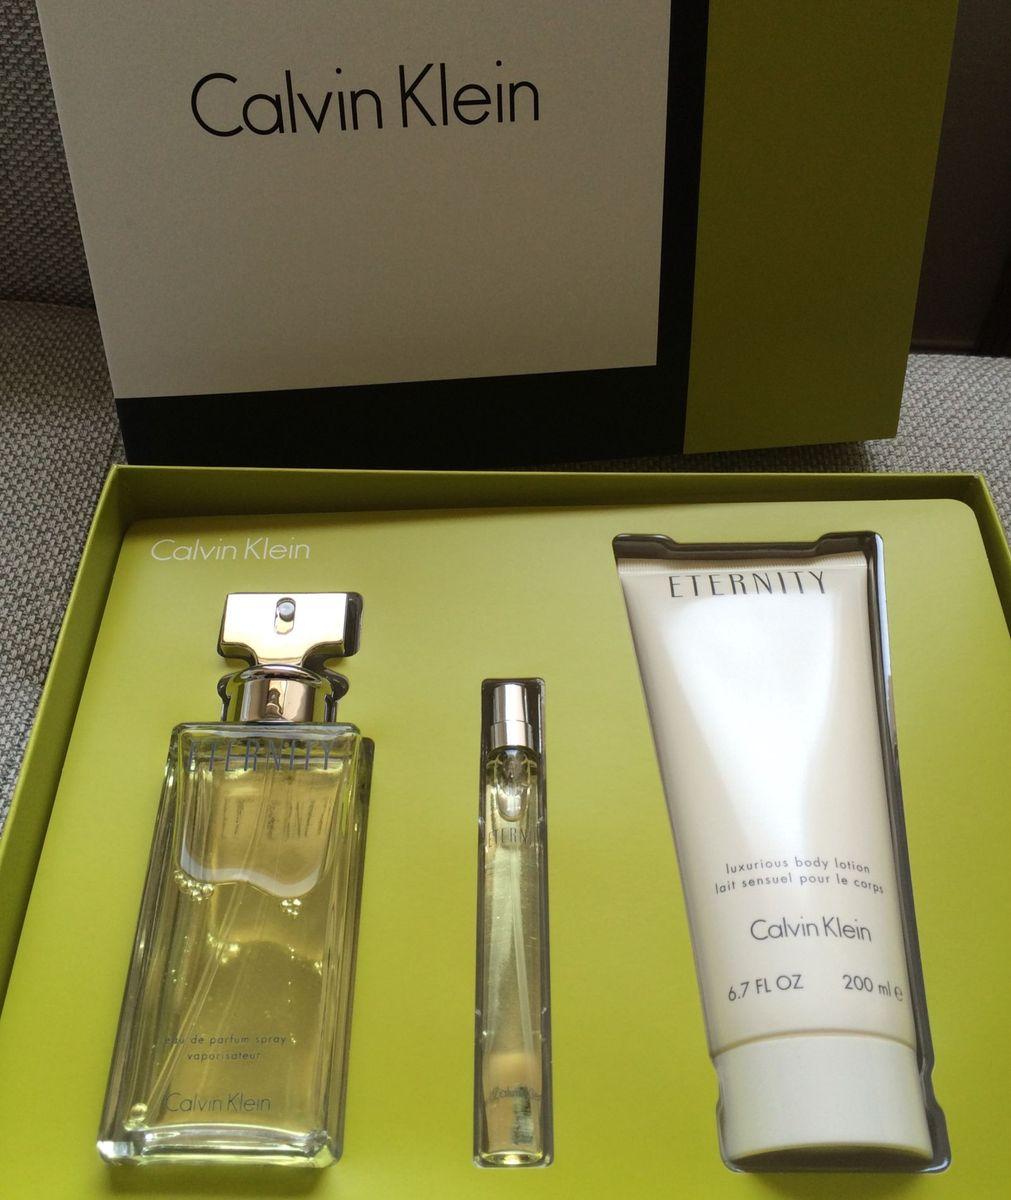 kit eternity feminino - perfume calvin klein.  Czm6ly9wag90b3muzw5qb2vplmnvbs5ici9wcm9kdwn0cy81odaxnjm0lzuwm2qwyzk2mdq1m2uwzjawmzvkymfjyjrlyzhkzwu0lmpwzw  ... da483d4a8b